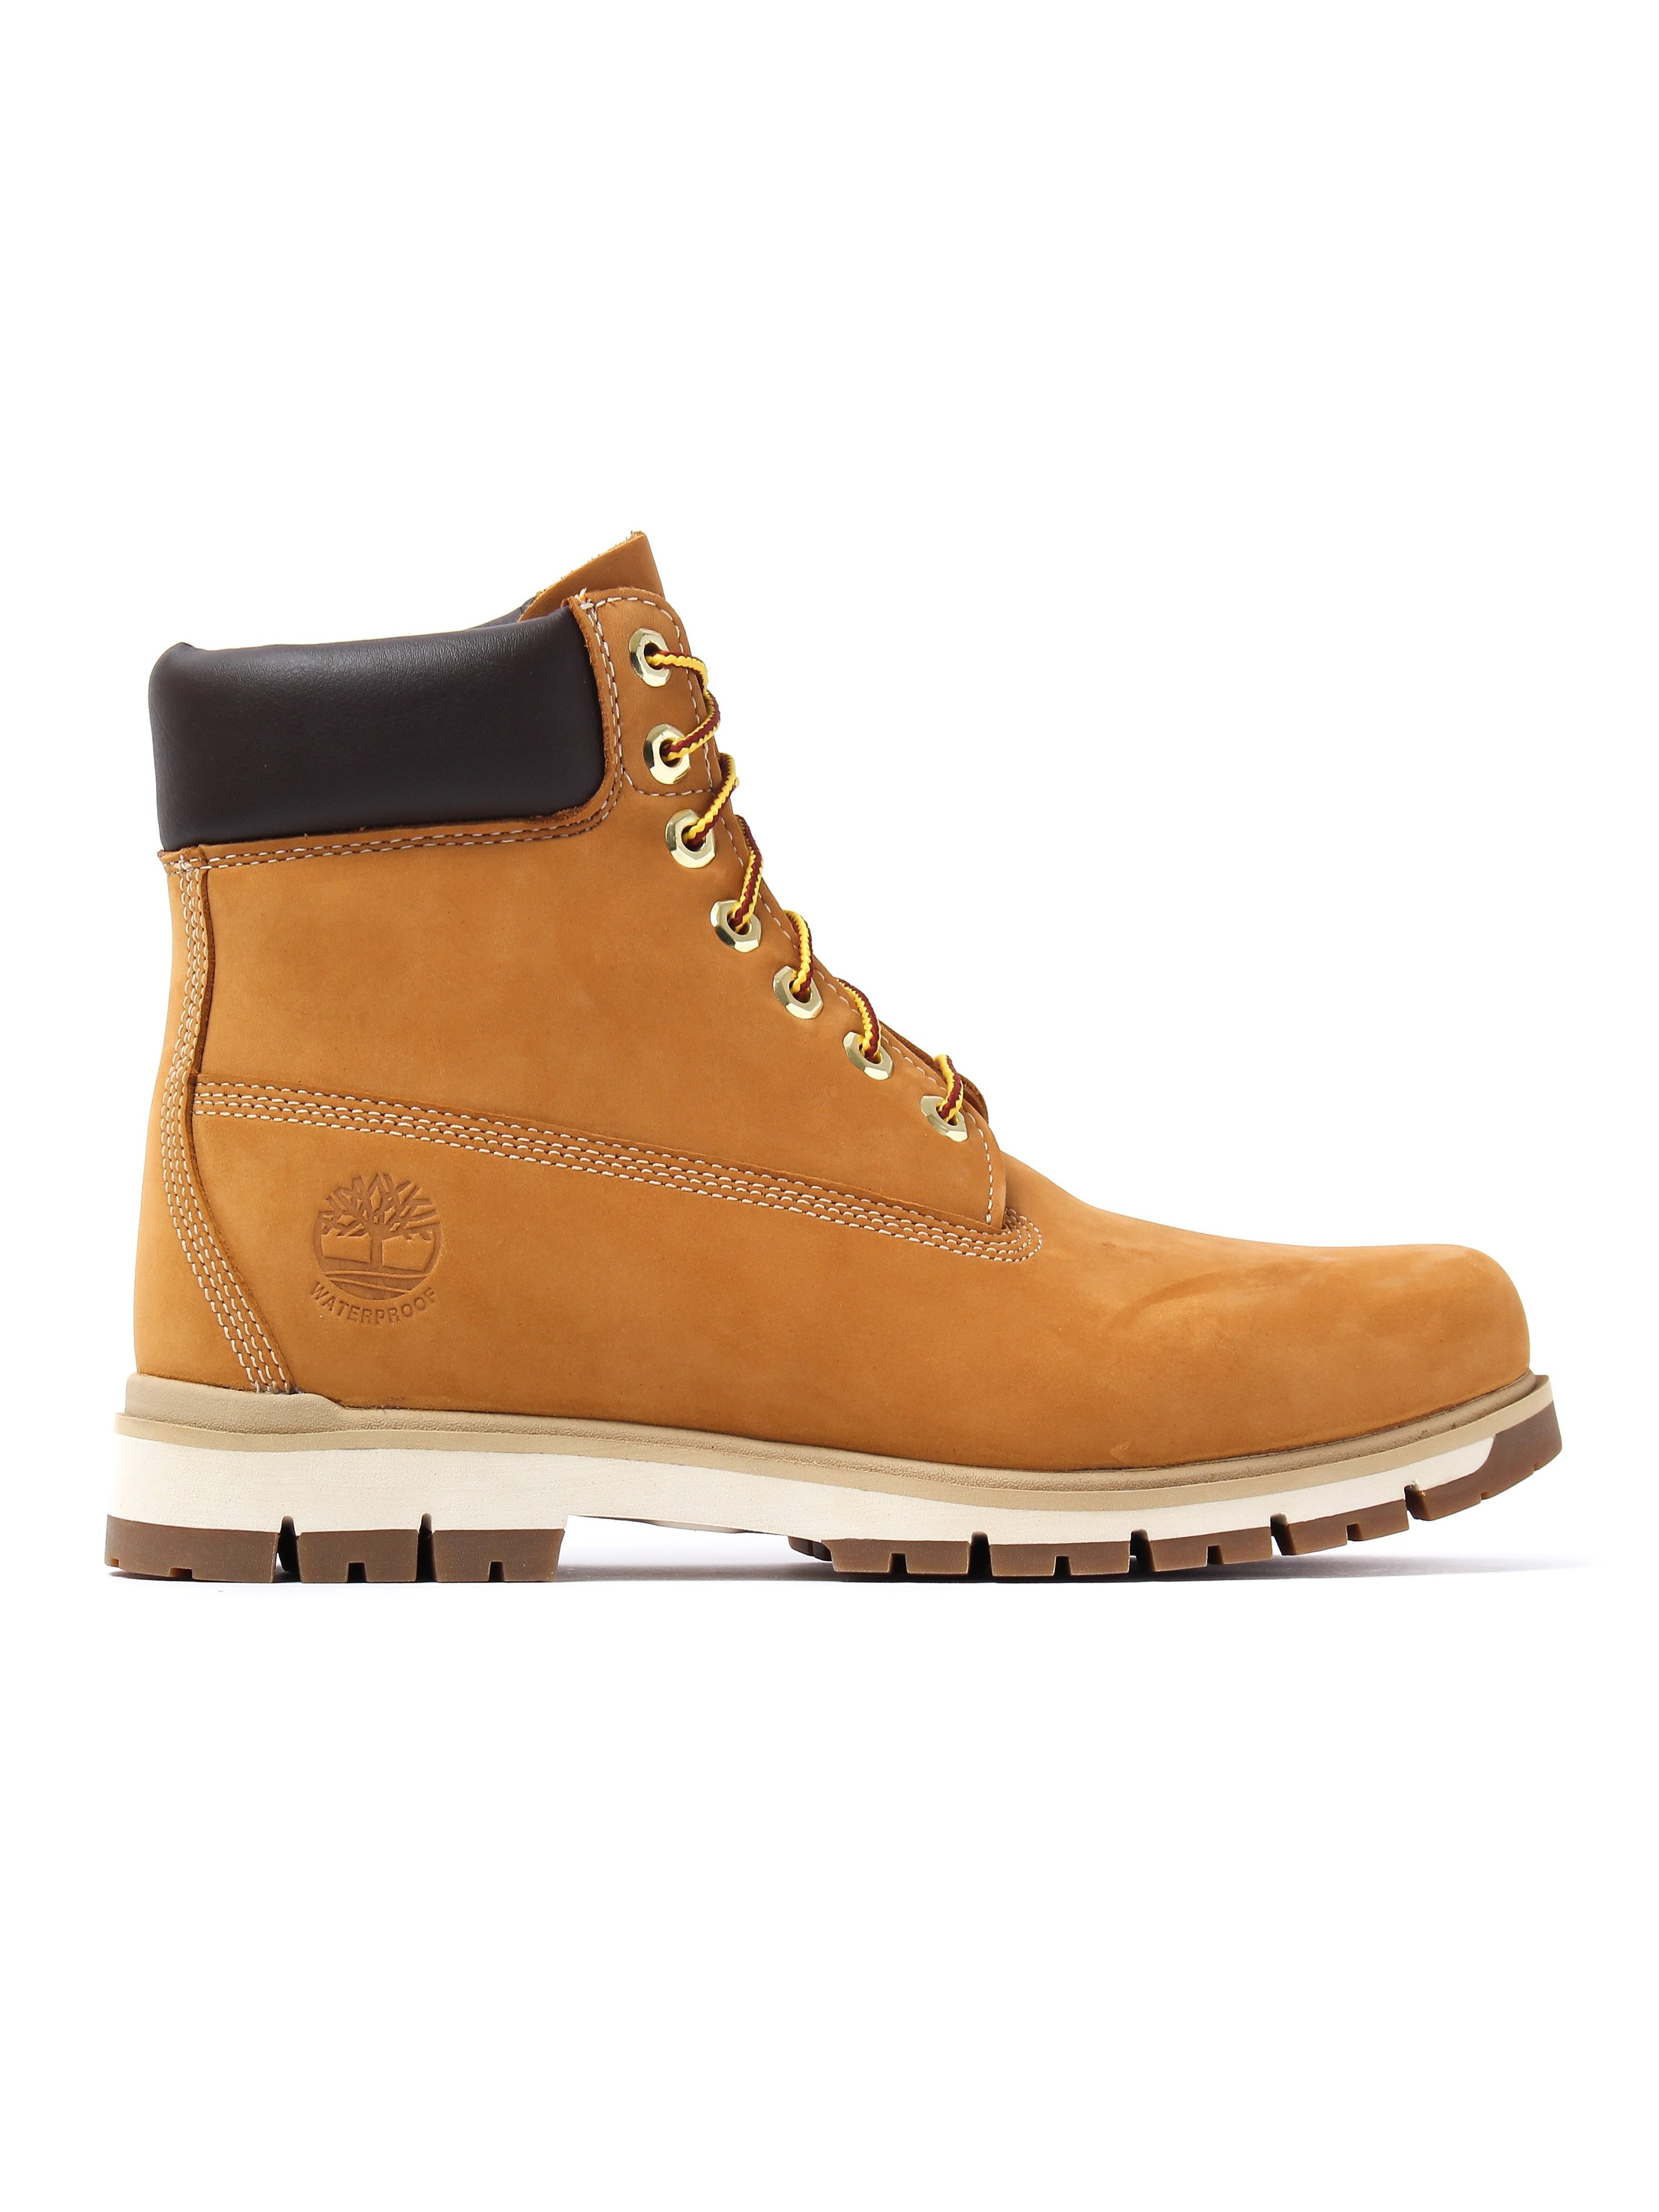 Timberland Men's Radford 6 Inch Boots - Wheat Nubuck